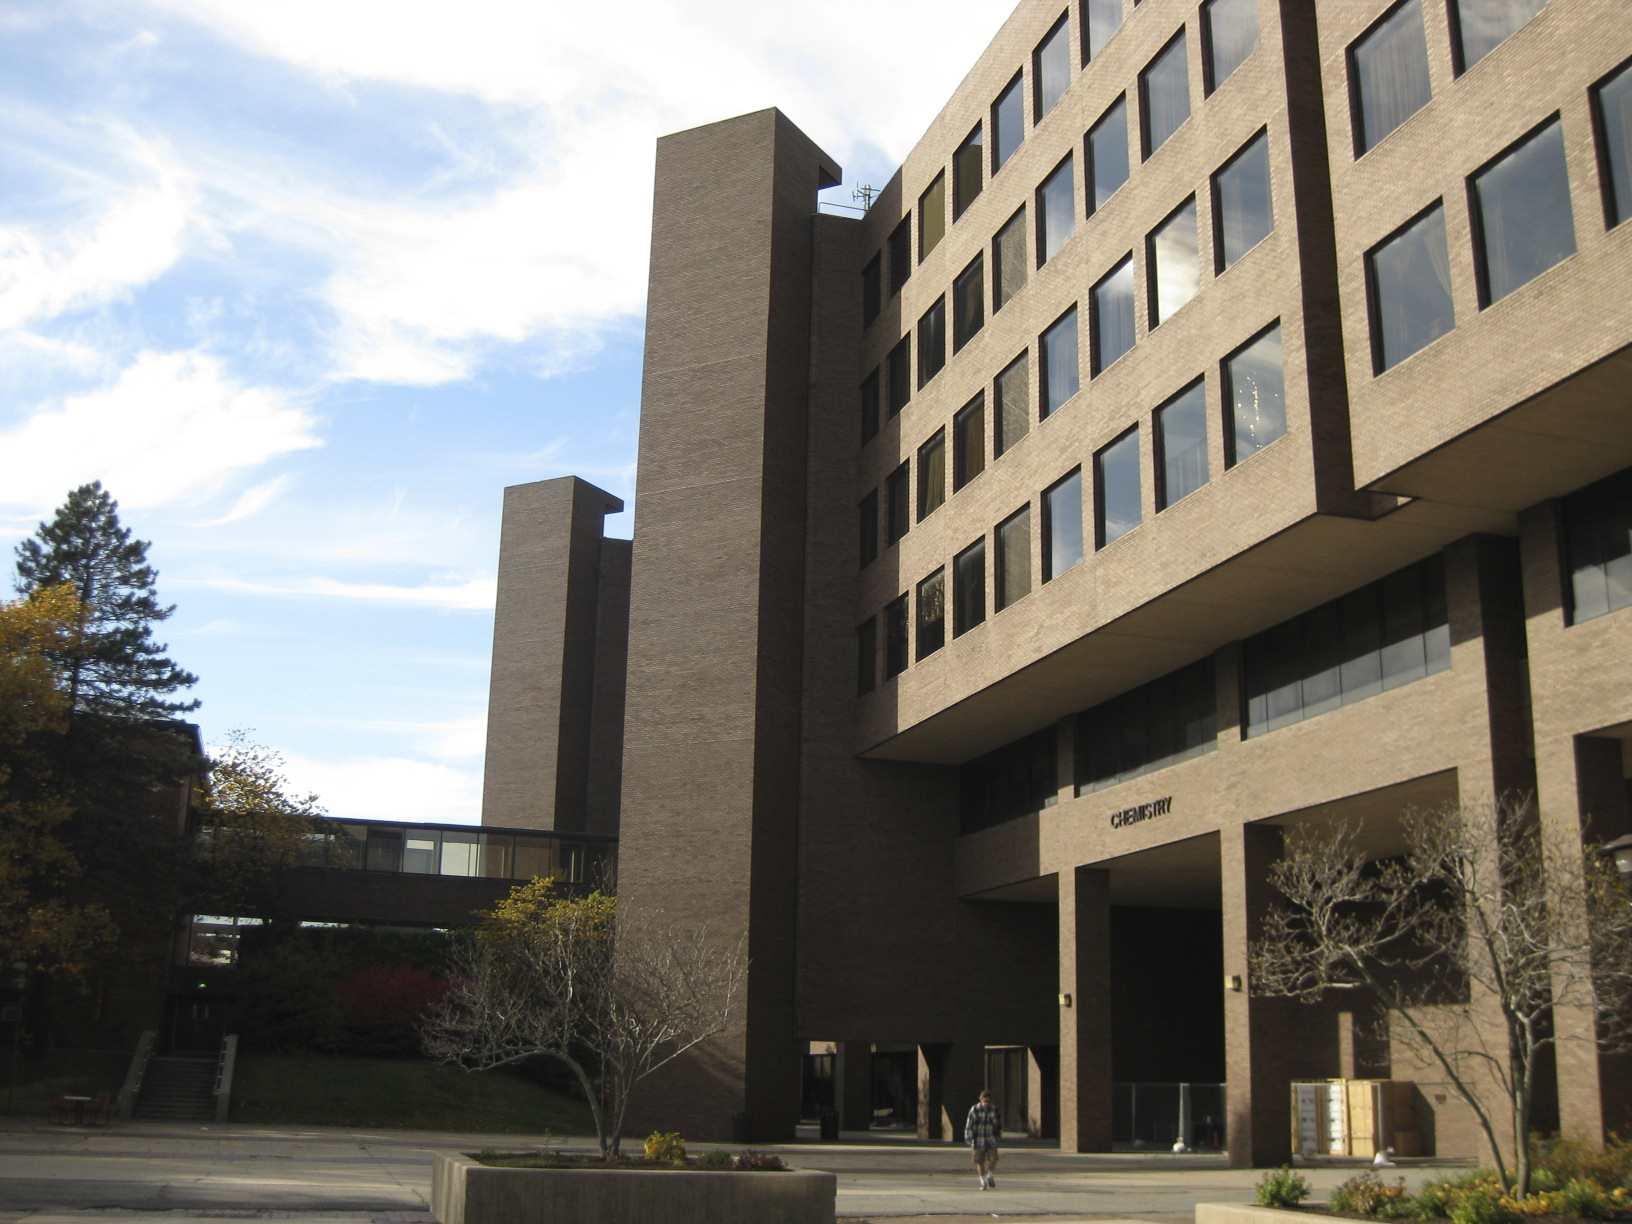 The Chemistry Building at Stony Brook University